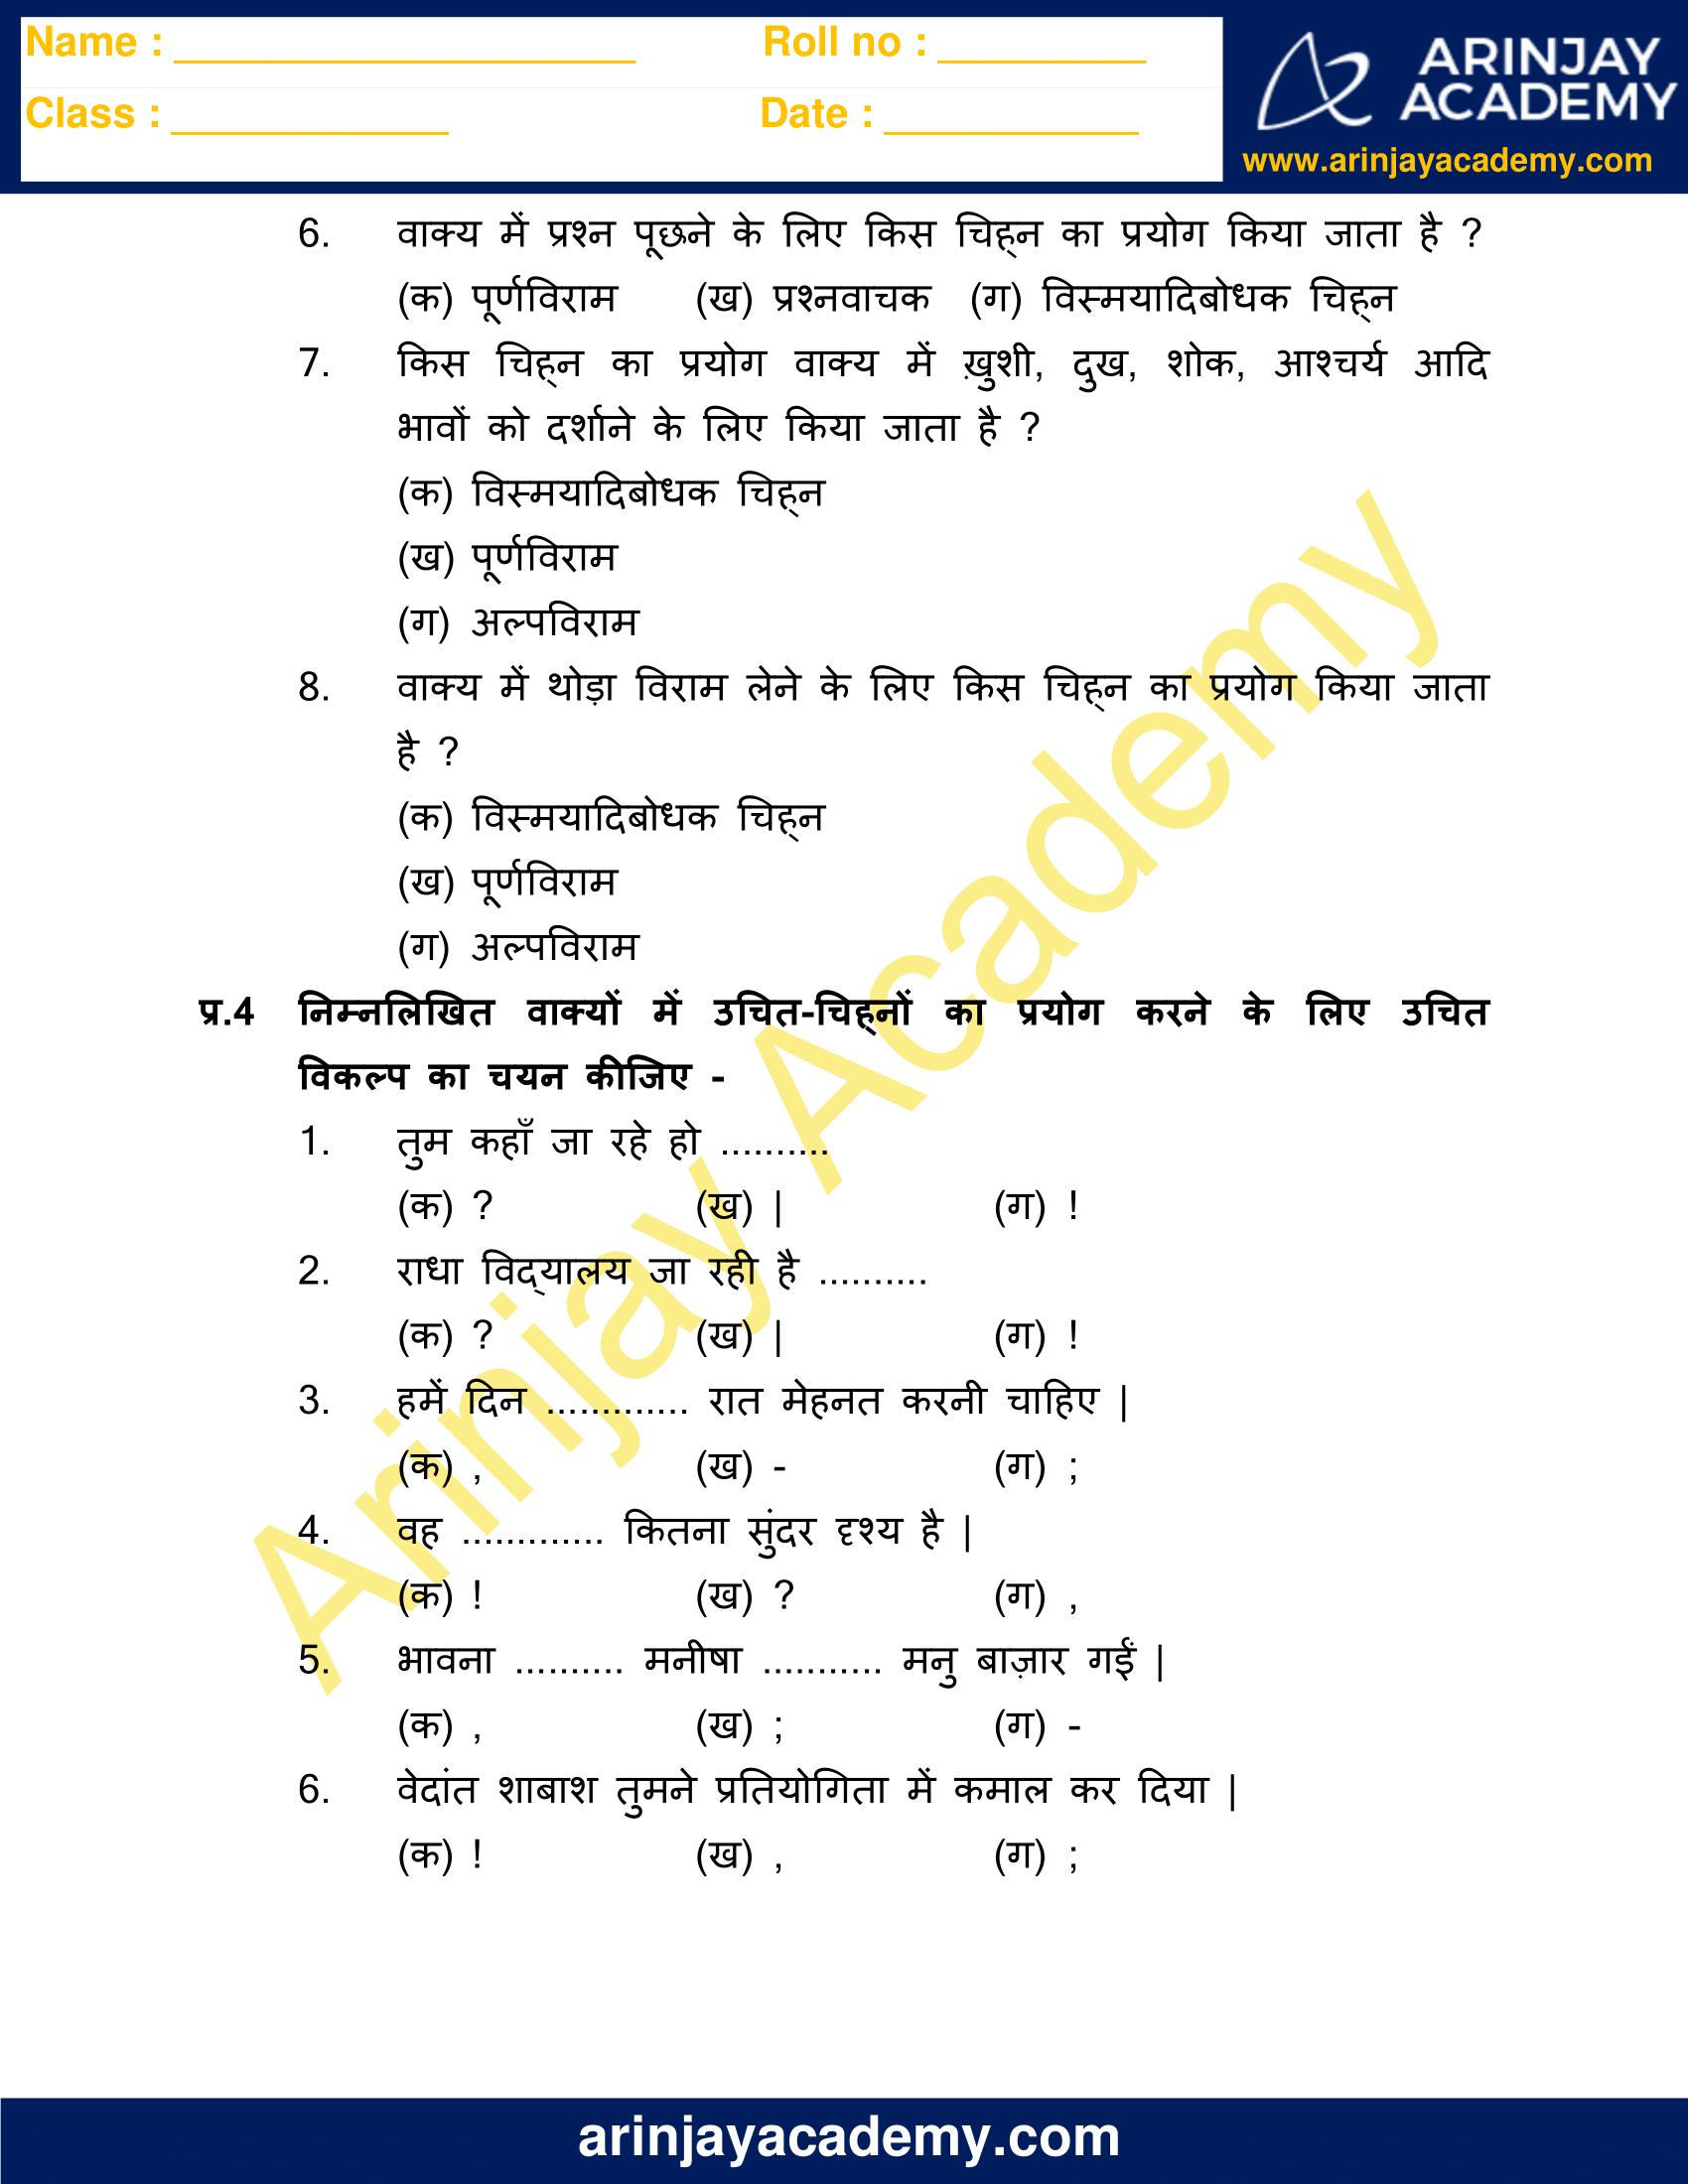 Viram Chinh Worksheet for Class 3 image 3